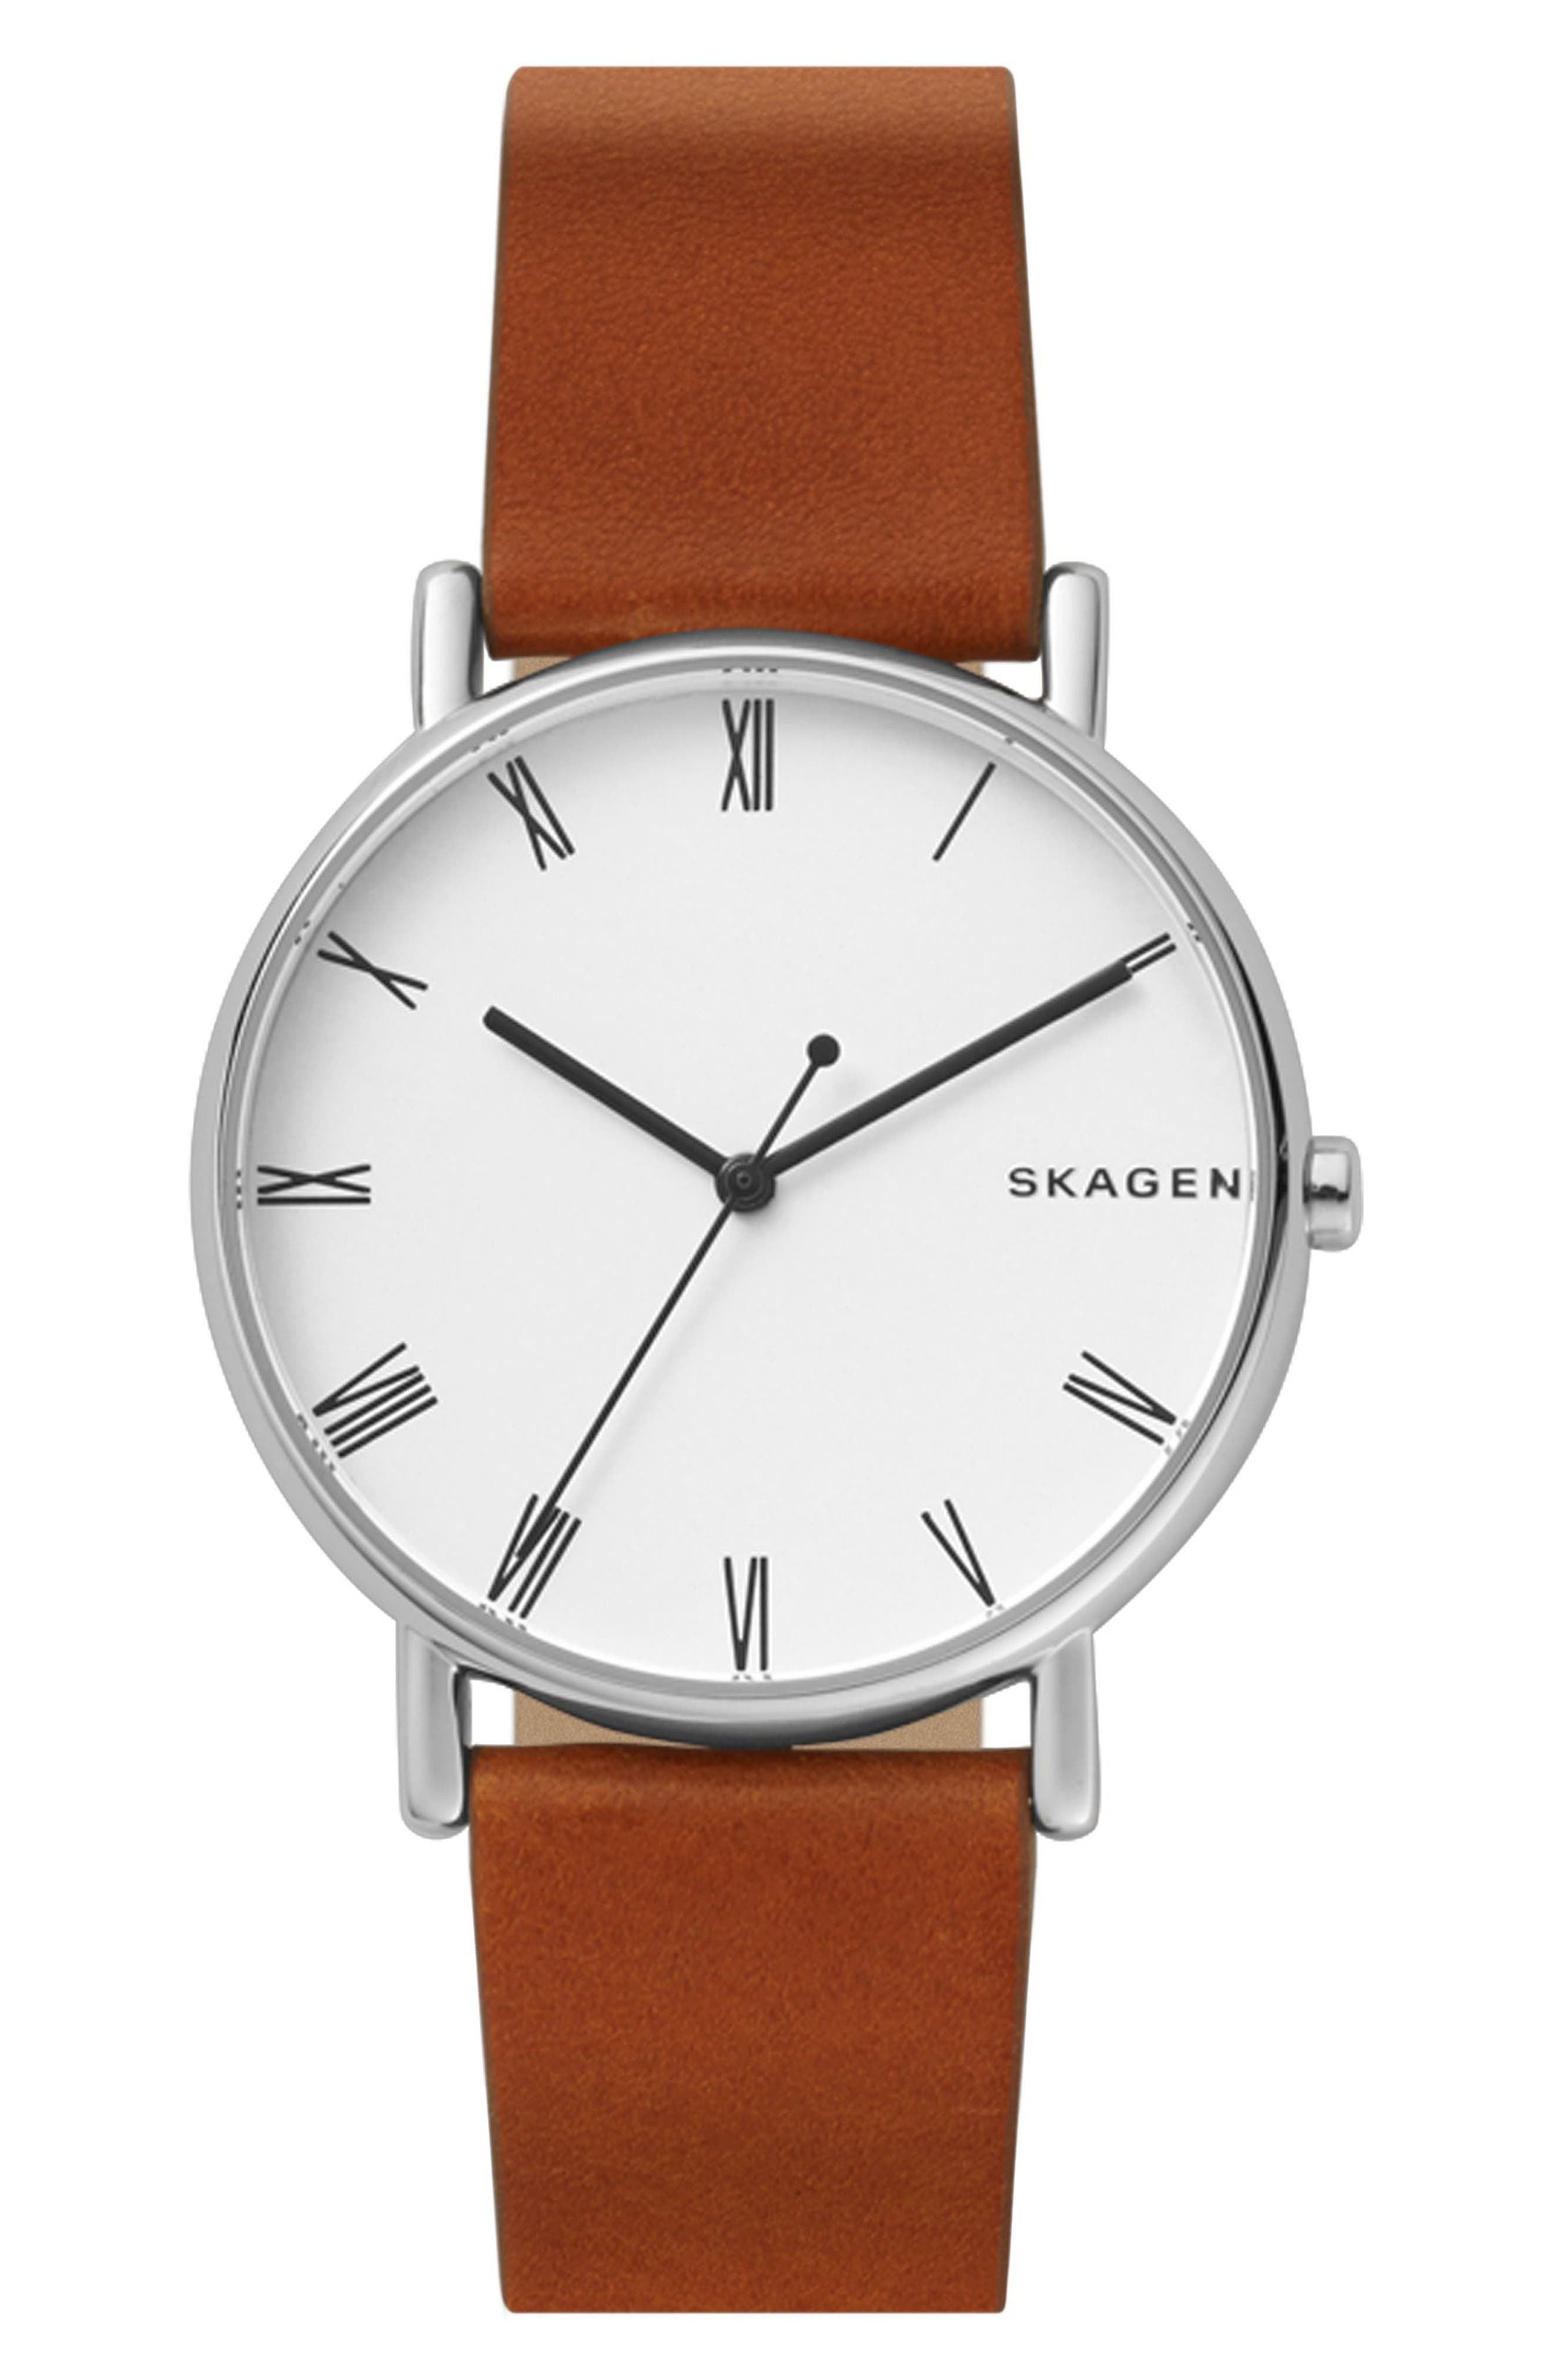 Main Image - Skagen Signatur Leather Strap Watch, 40mm